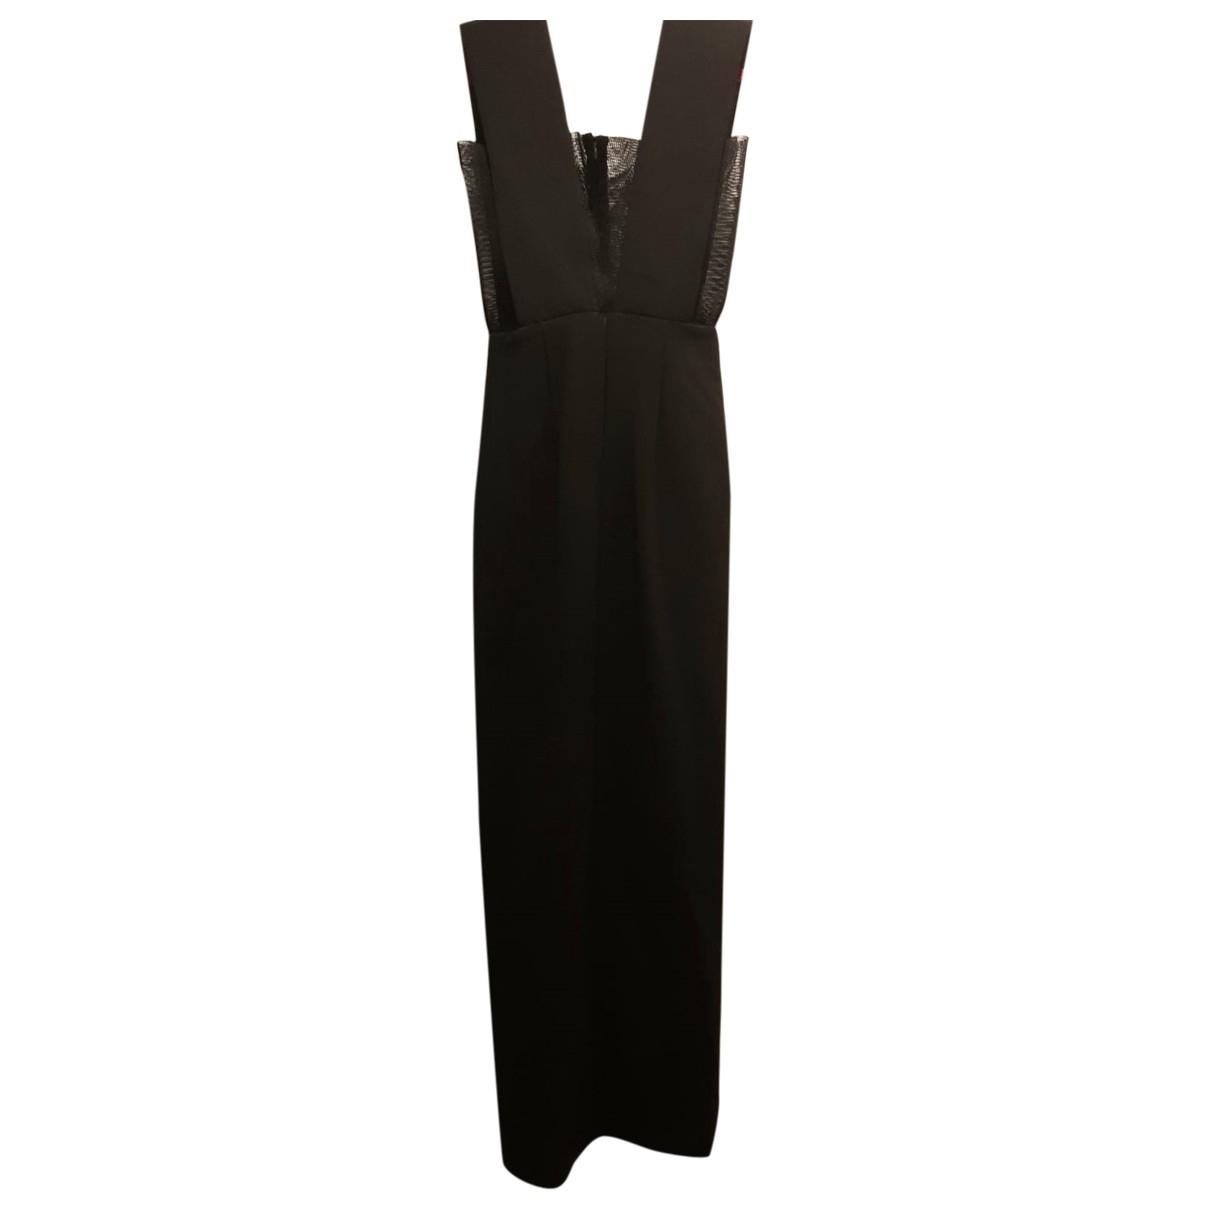 Solace London \N Black dress for Women 4 UK